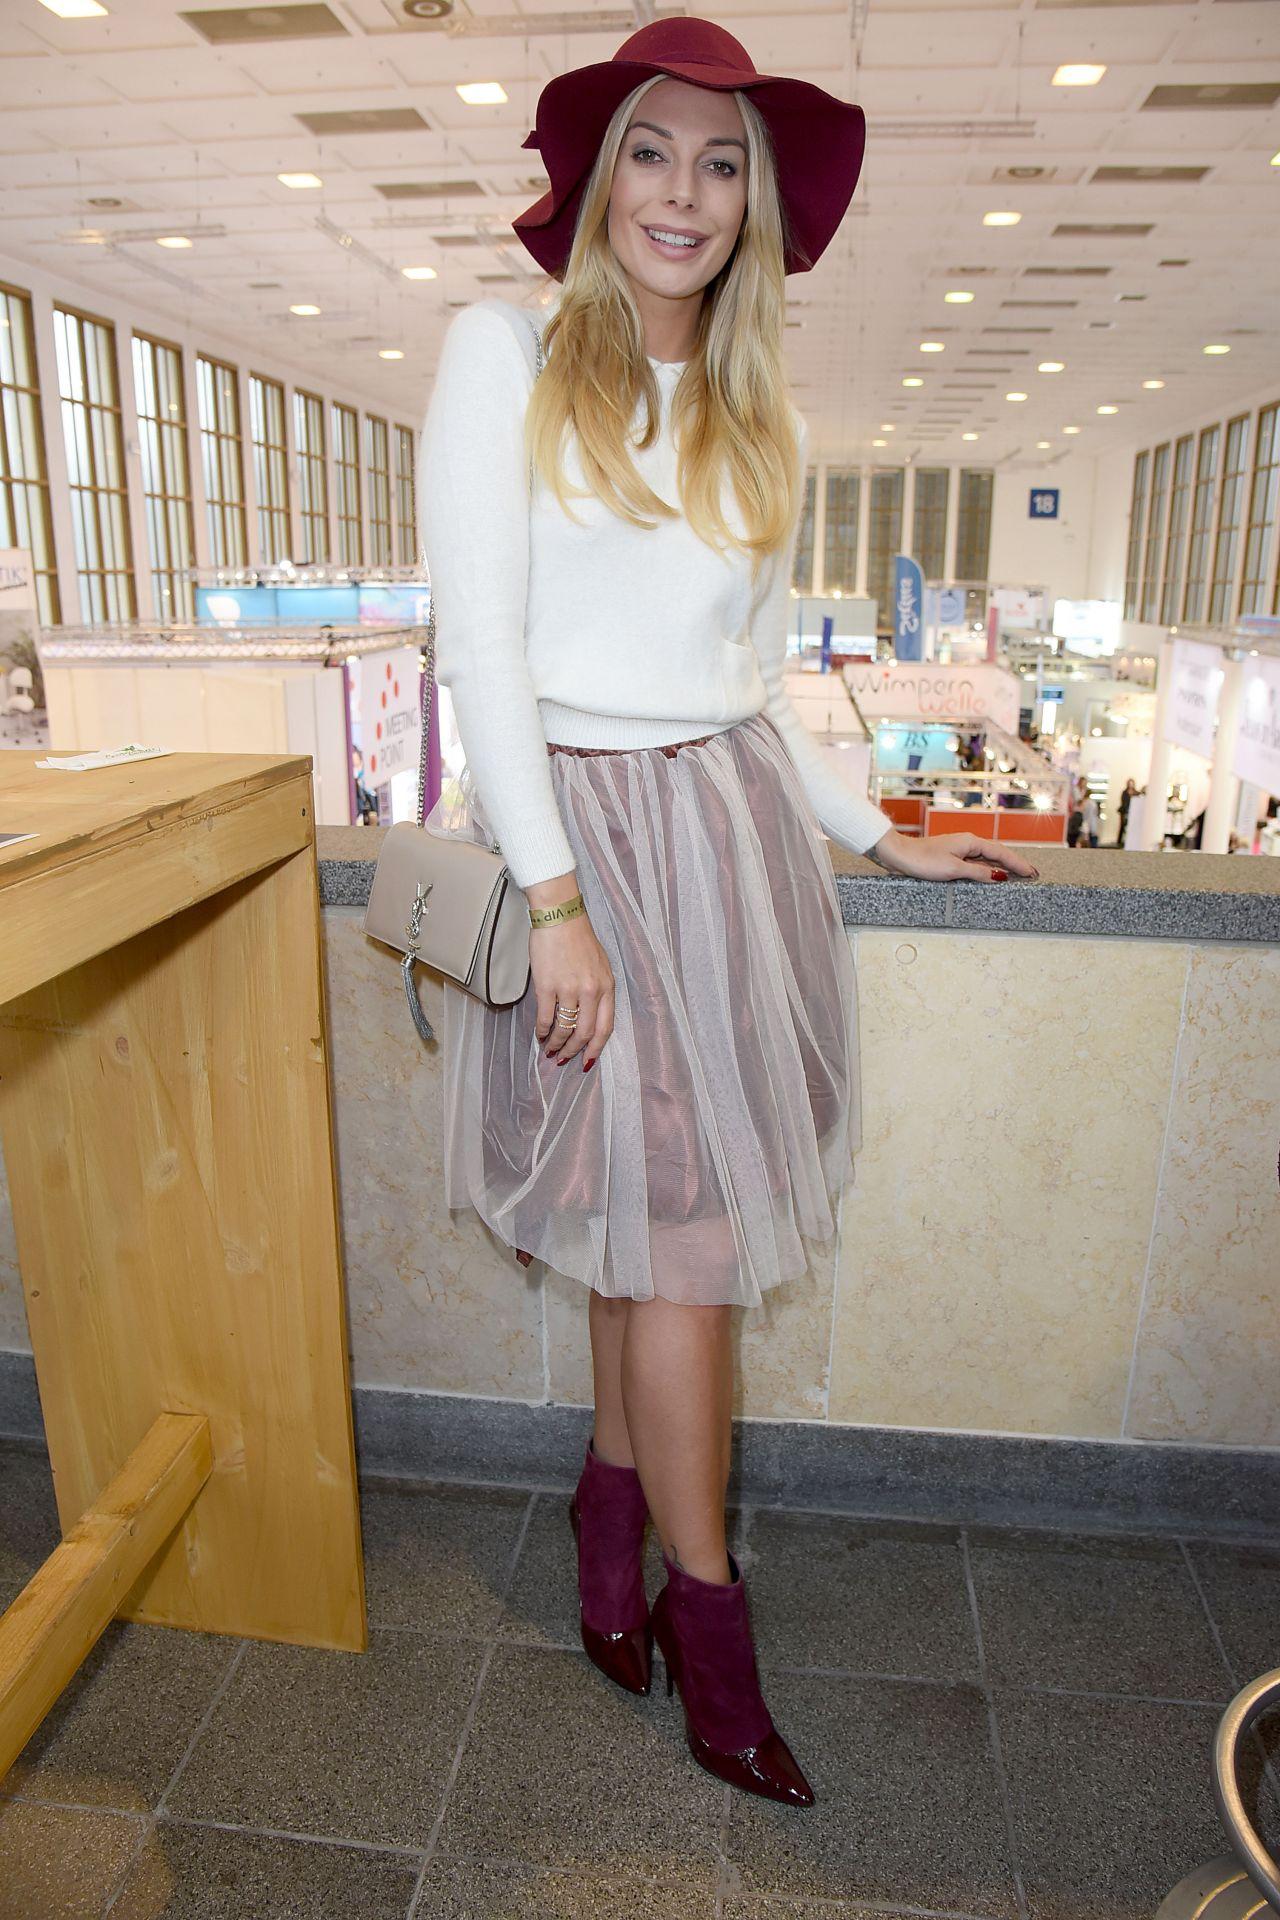 Annika Gassner – Cosmetica Newcomer Artist Award 2016 at Cosmetica Fair in Berlin 11/5/2016